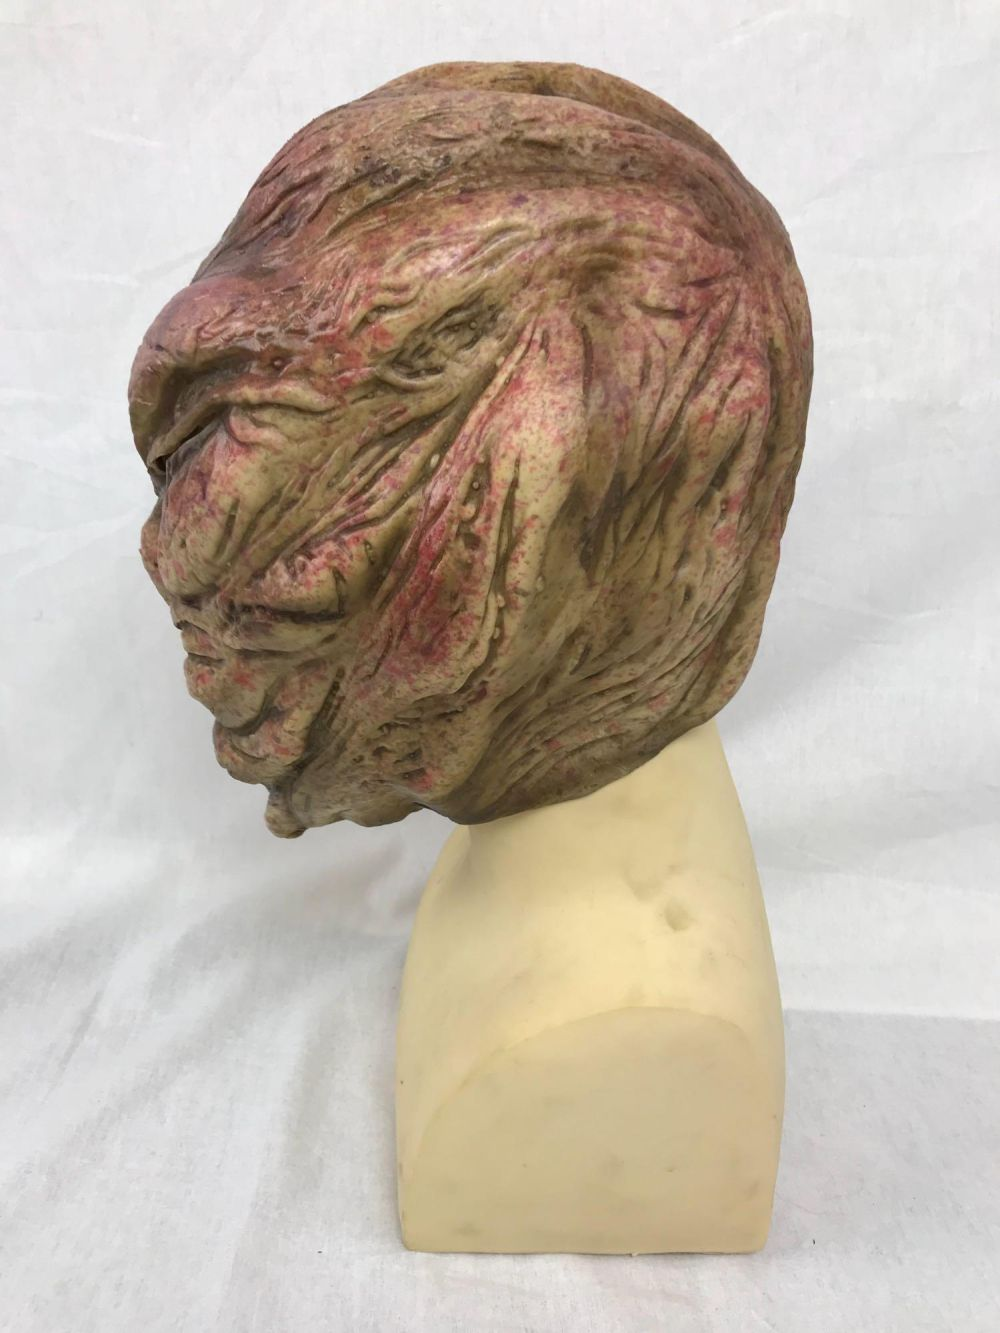 Lot 988: Halloween Mask, Professional Quality, Latex